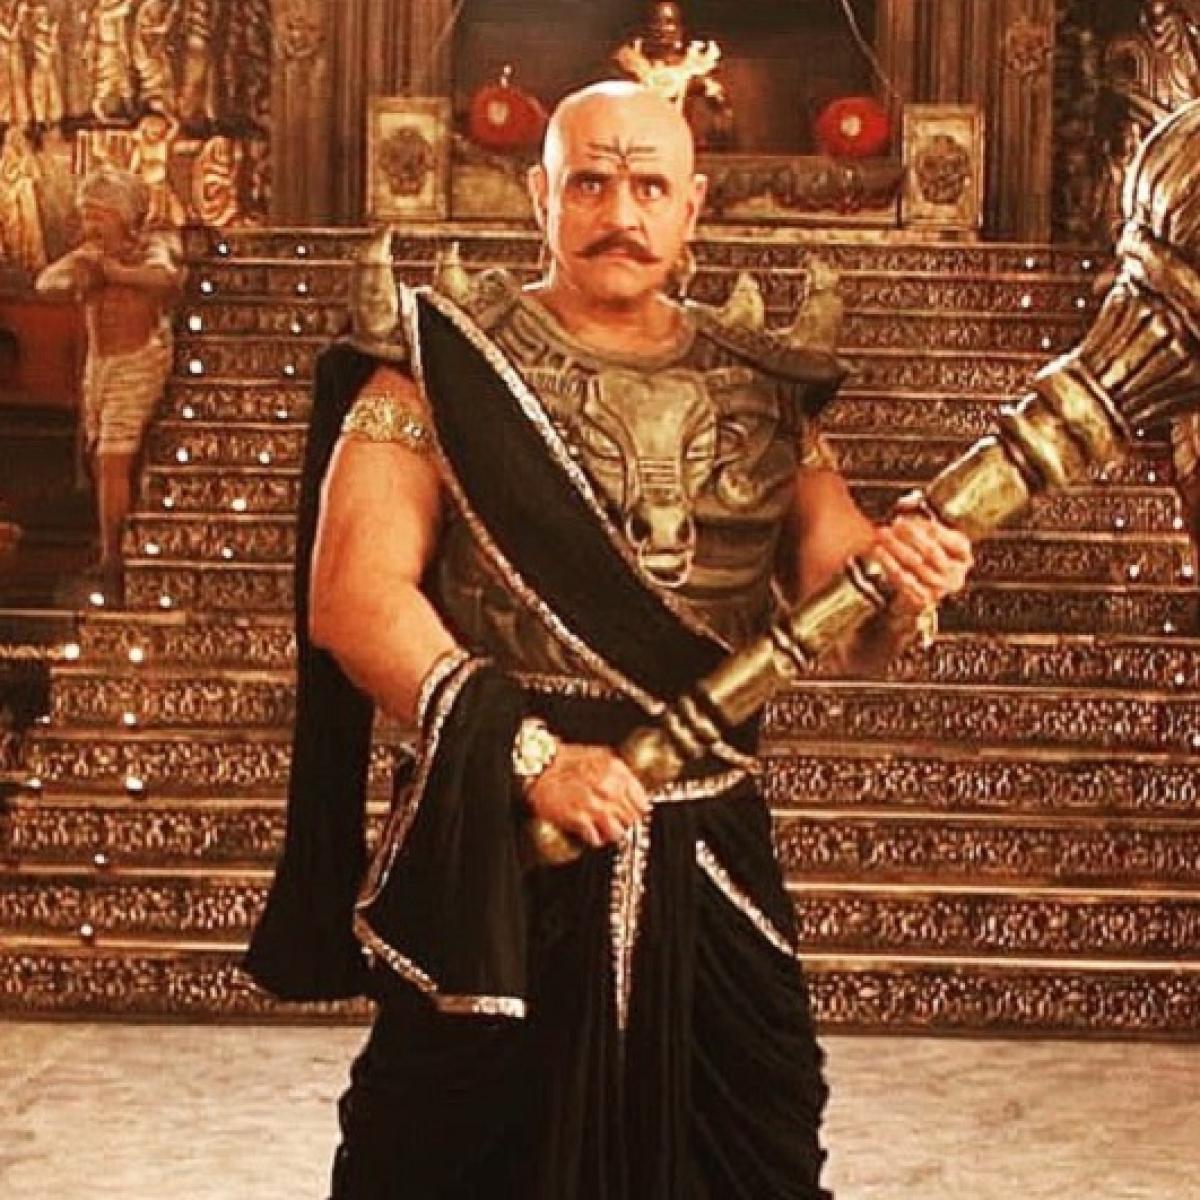 Halloween Special: Puneet Issar on his horror movie experience with Purana Mandir